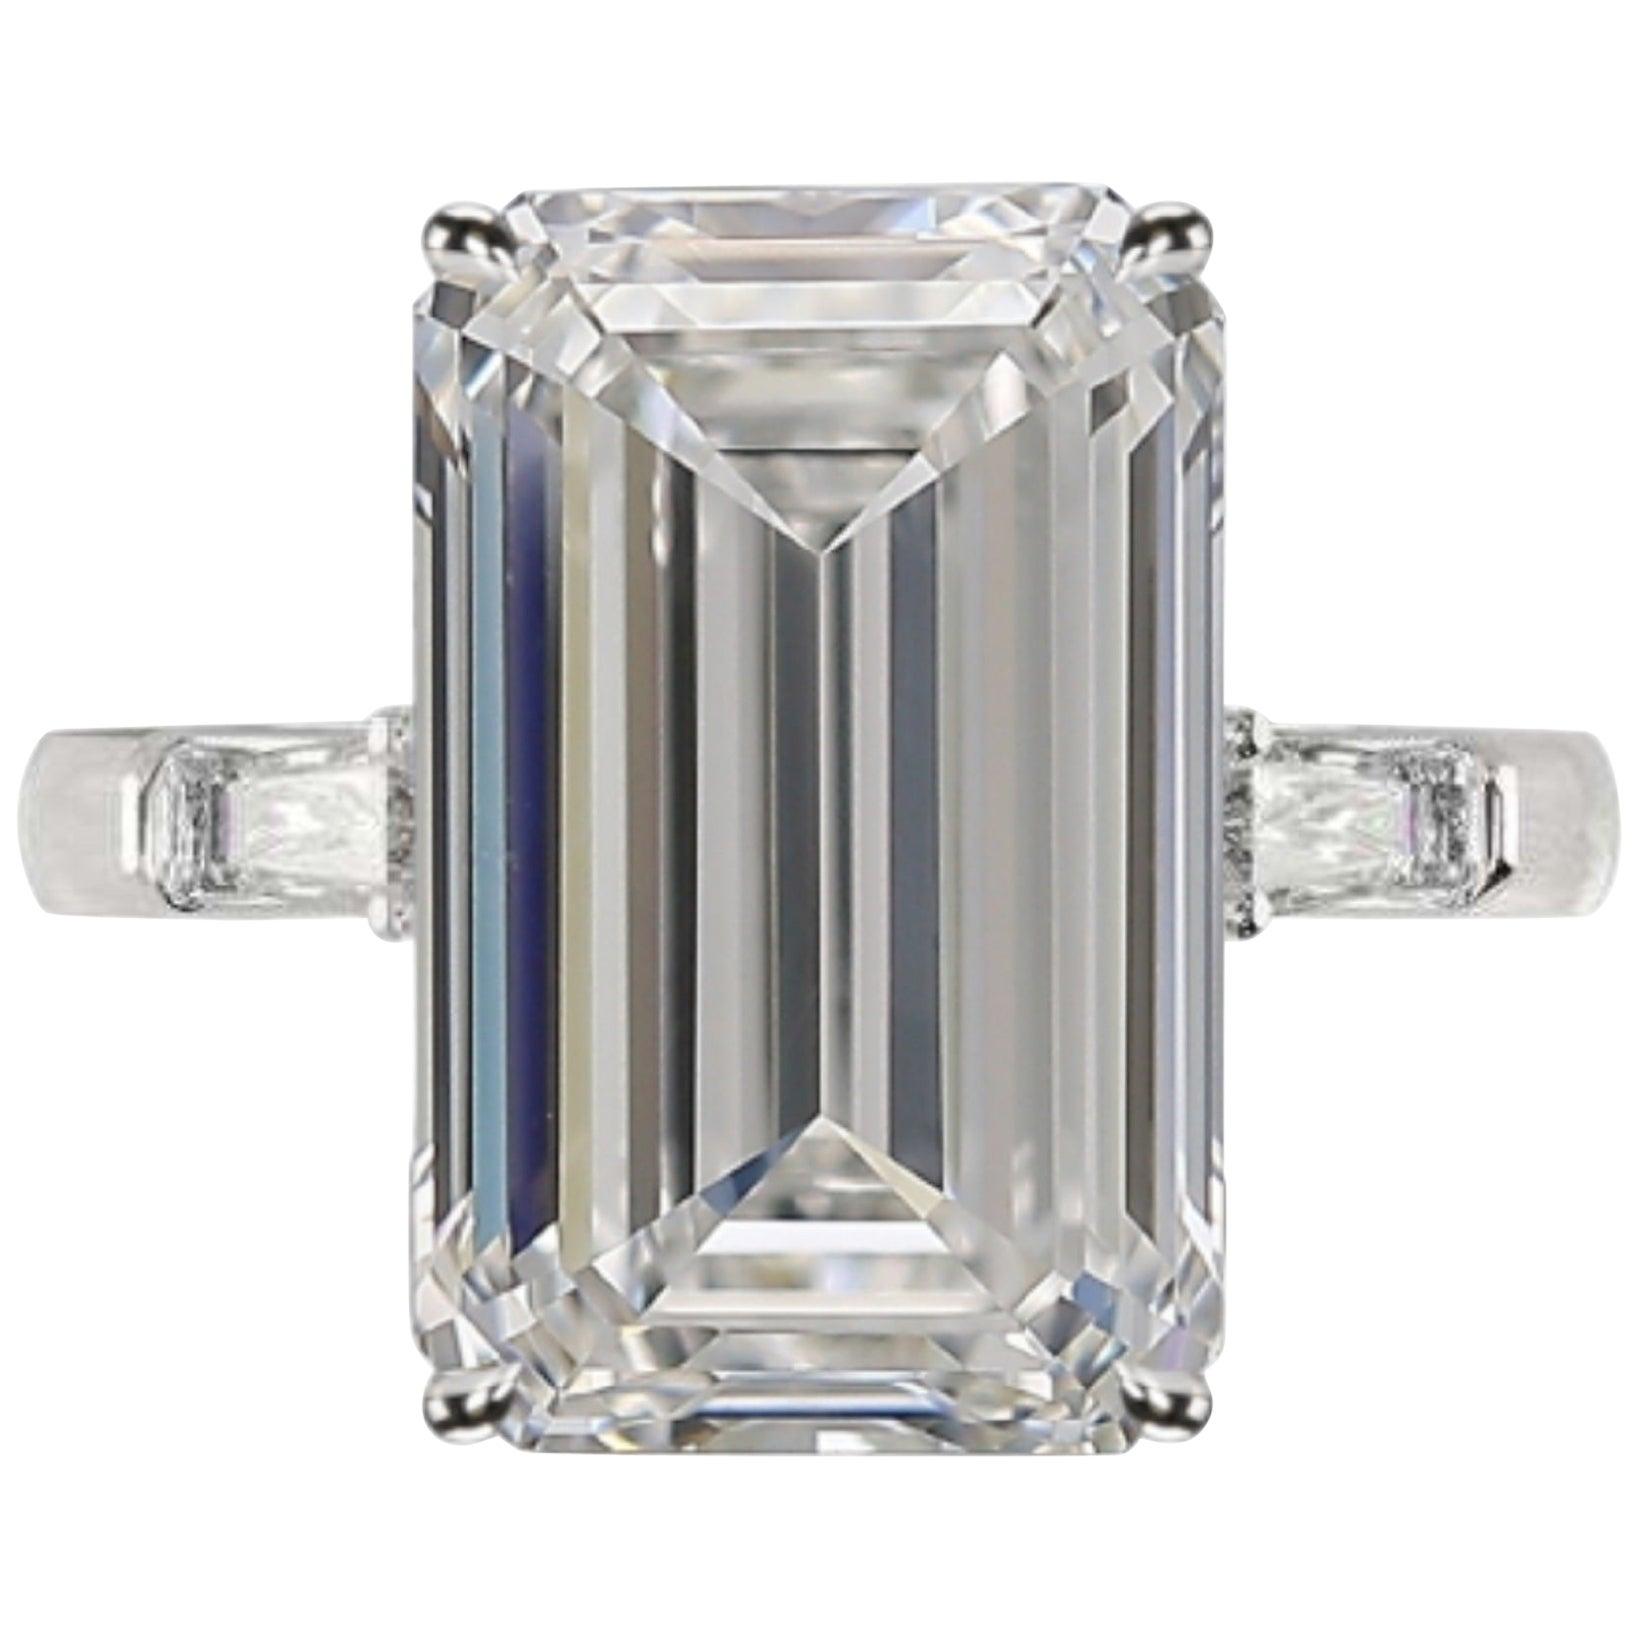 GIA Certified 5.50 Carat Emerald Cut Diamond Ring Very Long Ratio